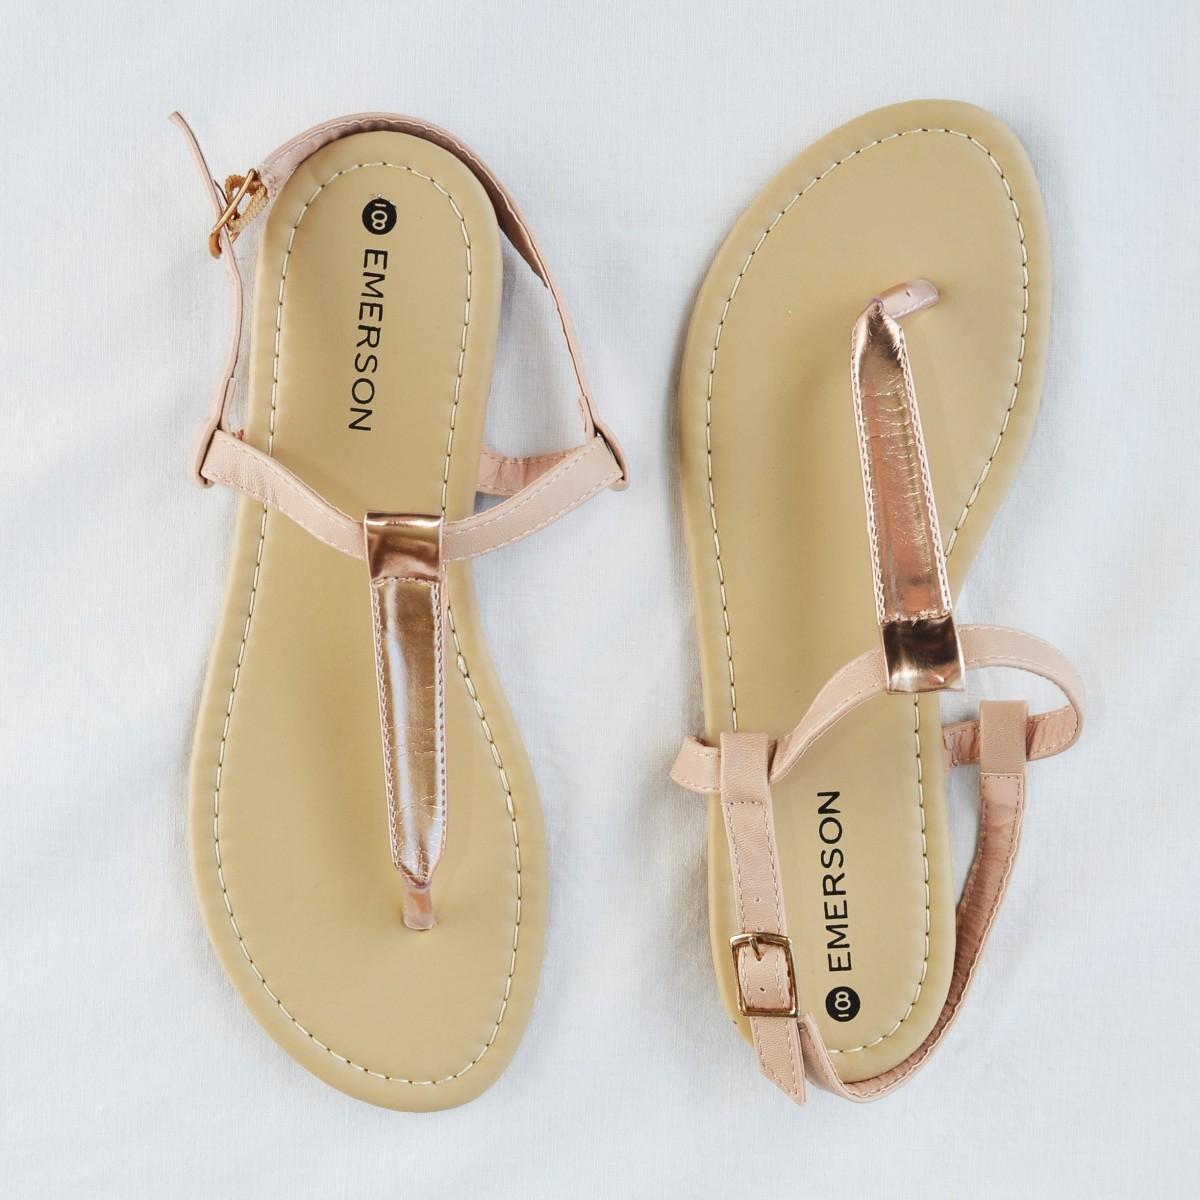 Women's sandals big w -  Big W Hana Toepost Sandal